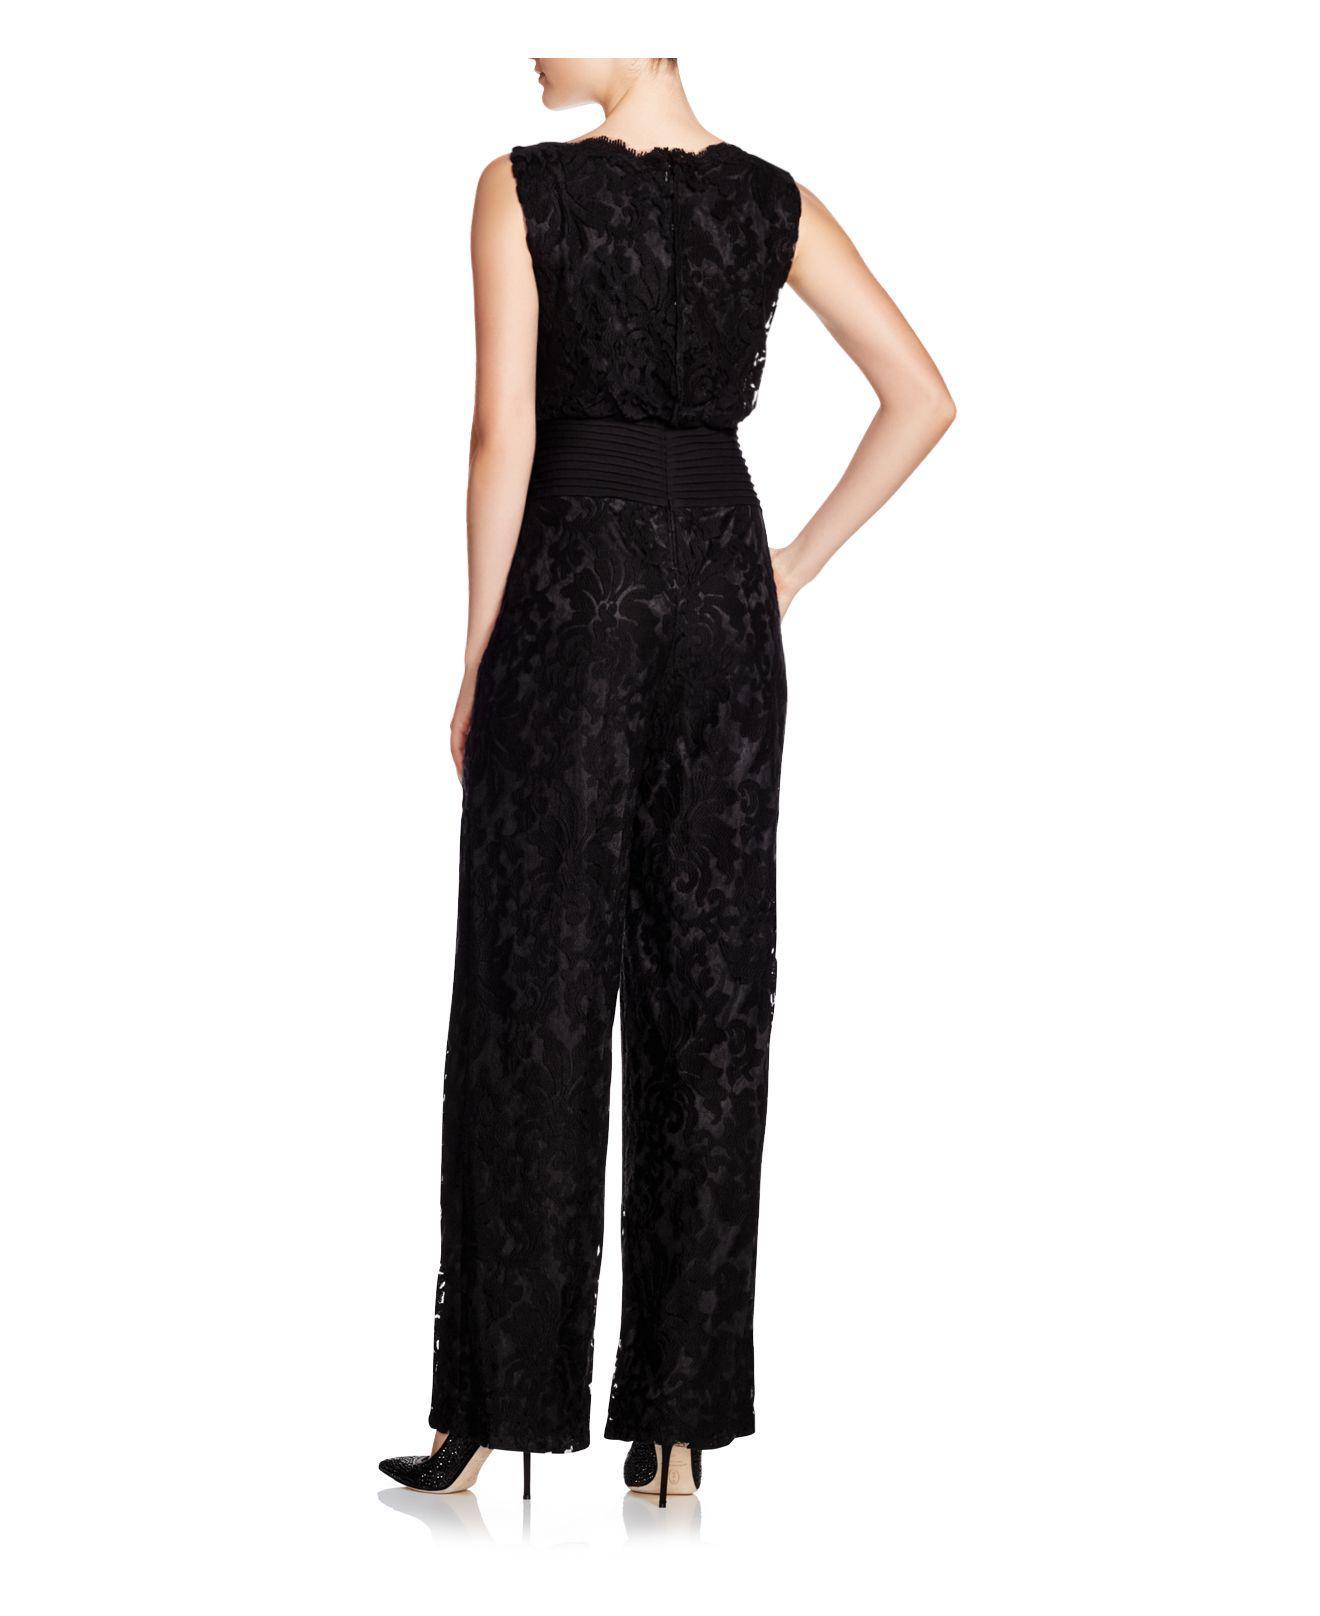 9e5290eb88bea Tadashi Shoji Sleeveless Blouson Lace Jumpsuit in Black - Lyst